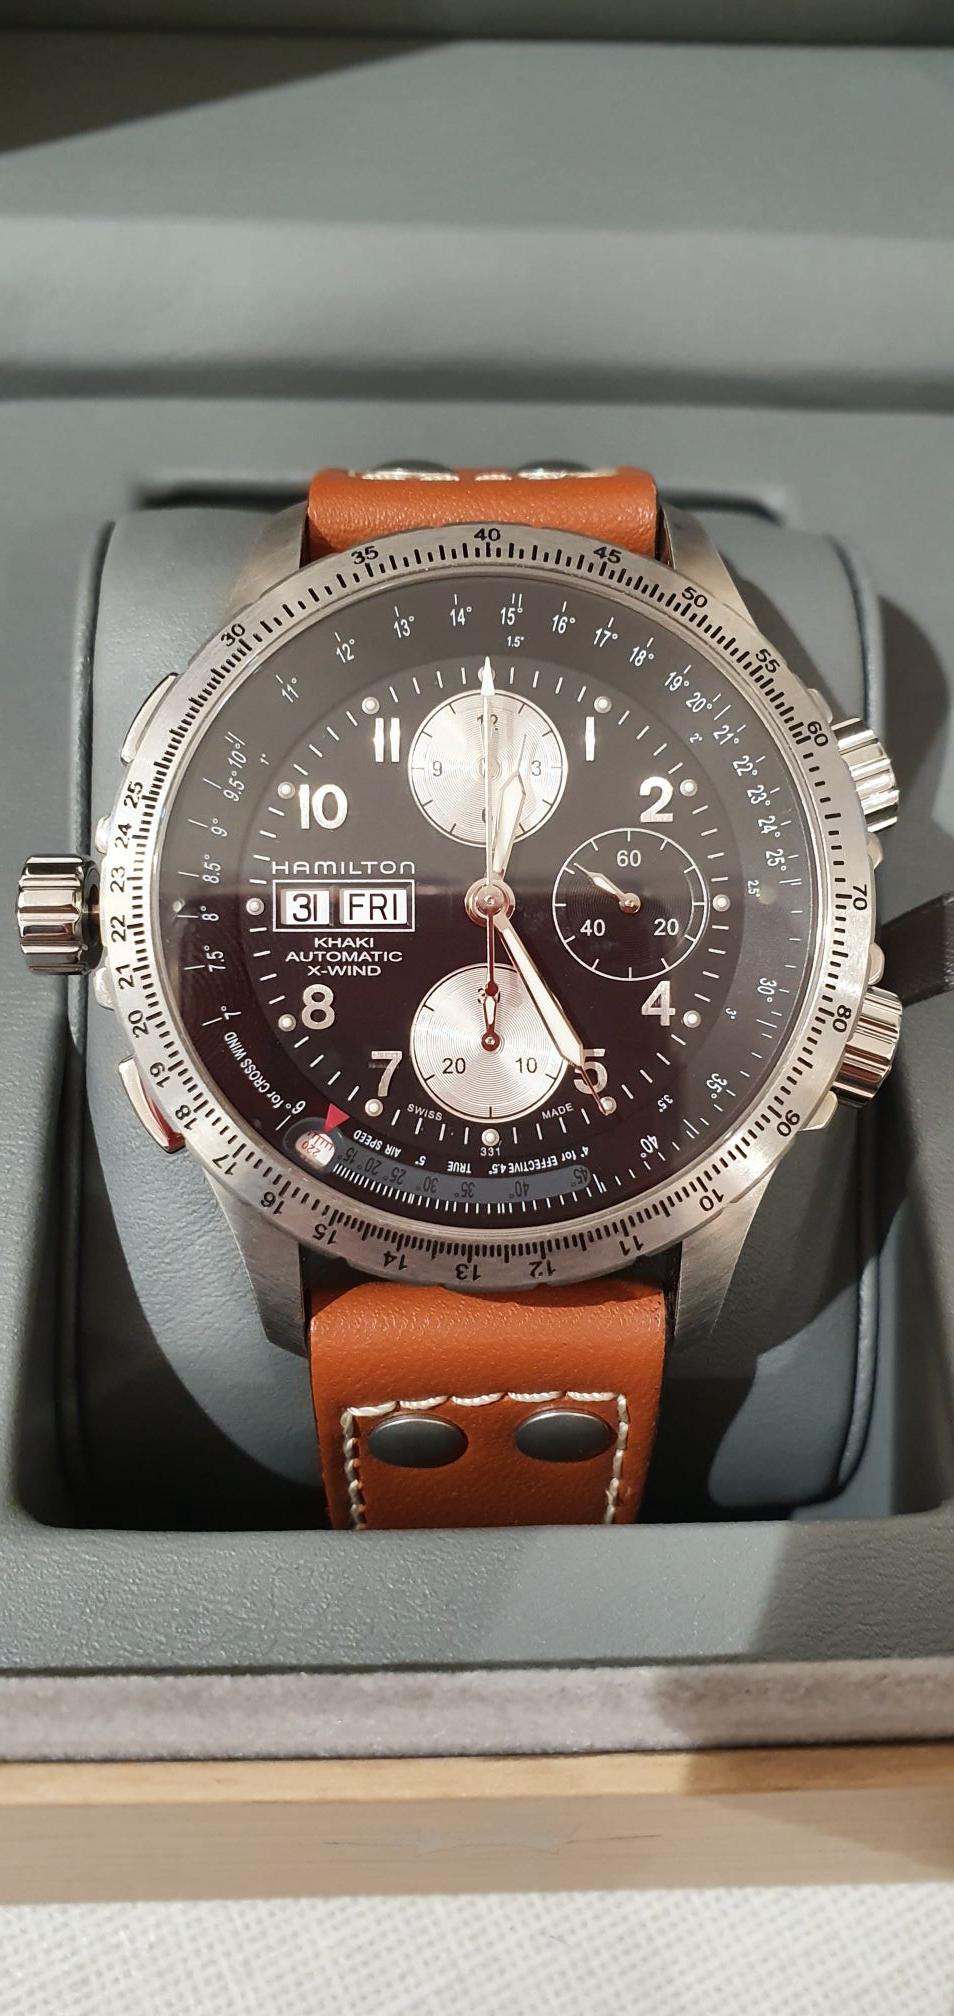 Sélection de montres Hamilton, Herberlin, Rado, Seiko, Tissot en soldes - Ex : Montre homme Hamilton khahi X Wind - Dotter Guebwiller (68)